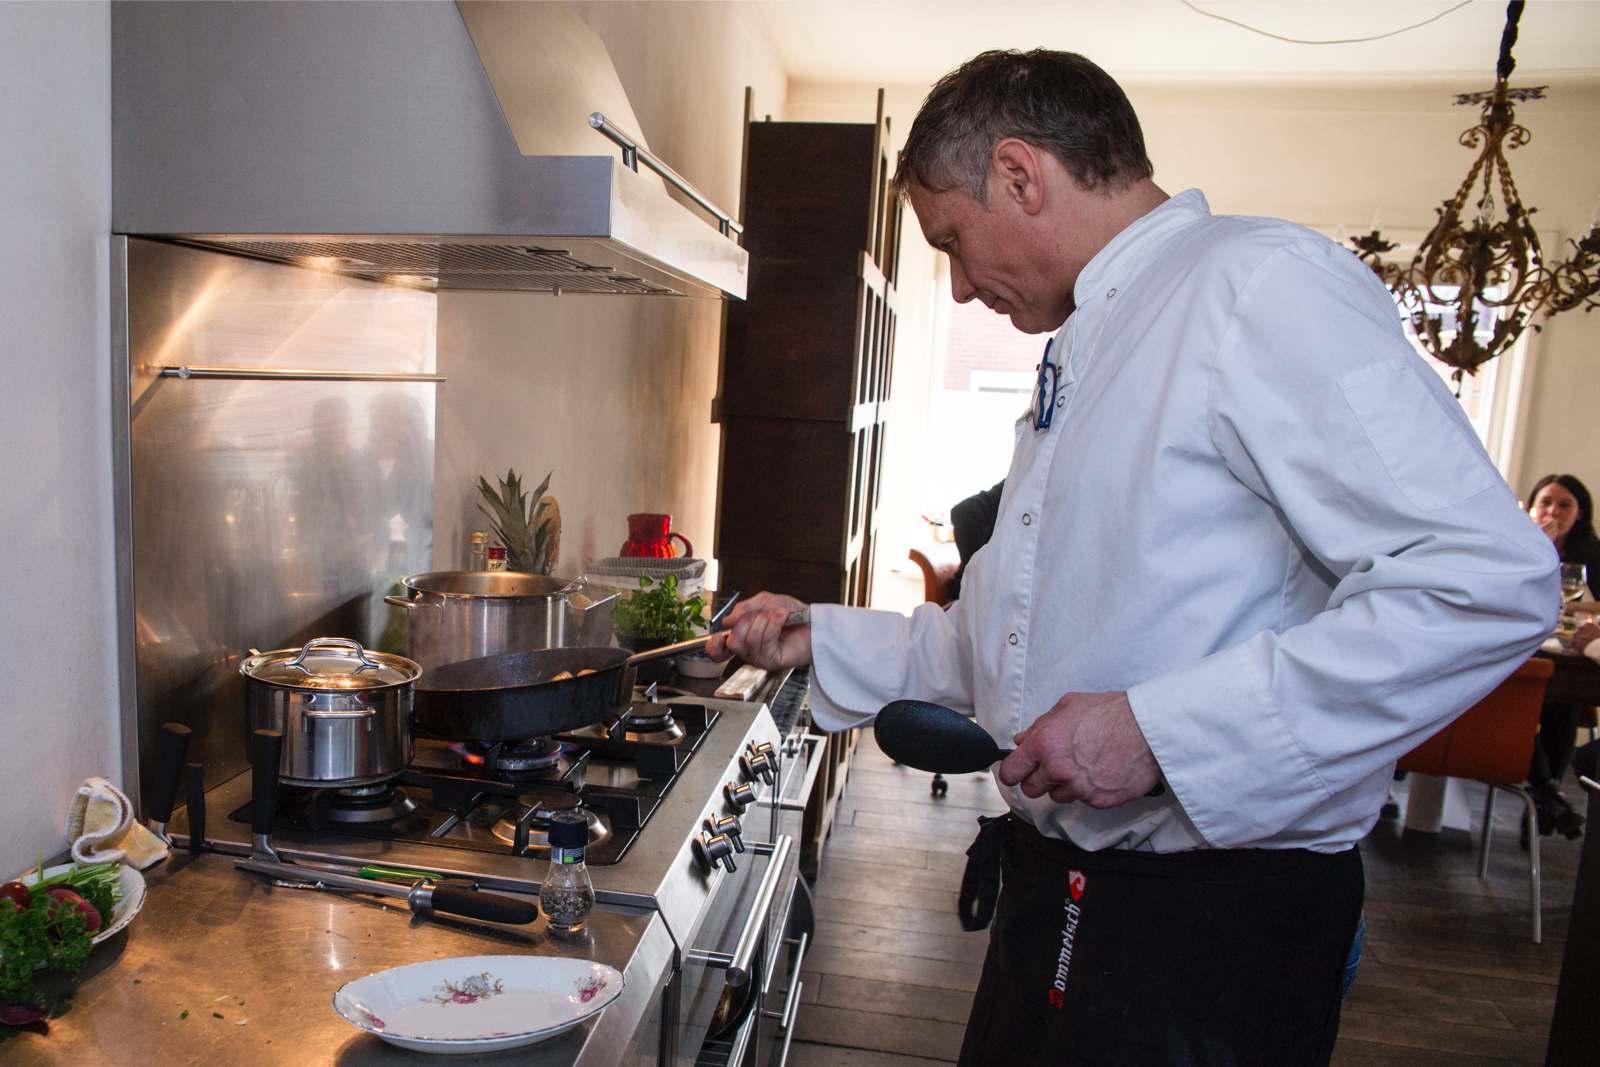 Thuis koken edwin kooktedwin kookt - Keuken wereld thuis ...